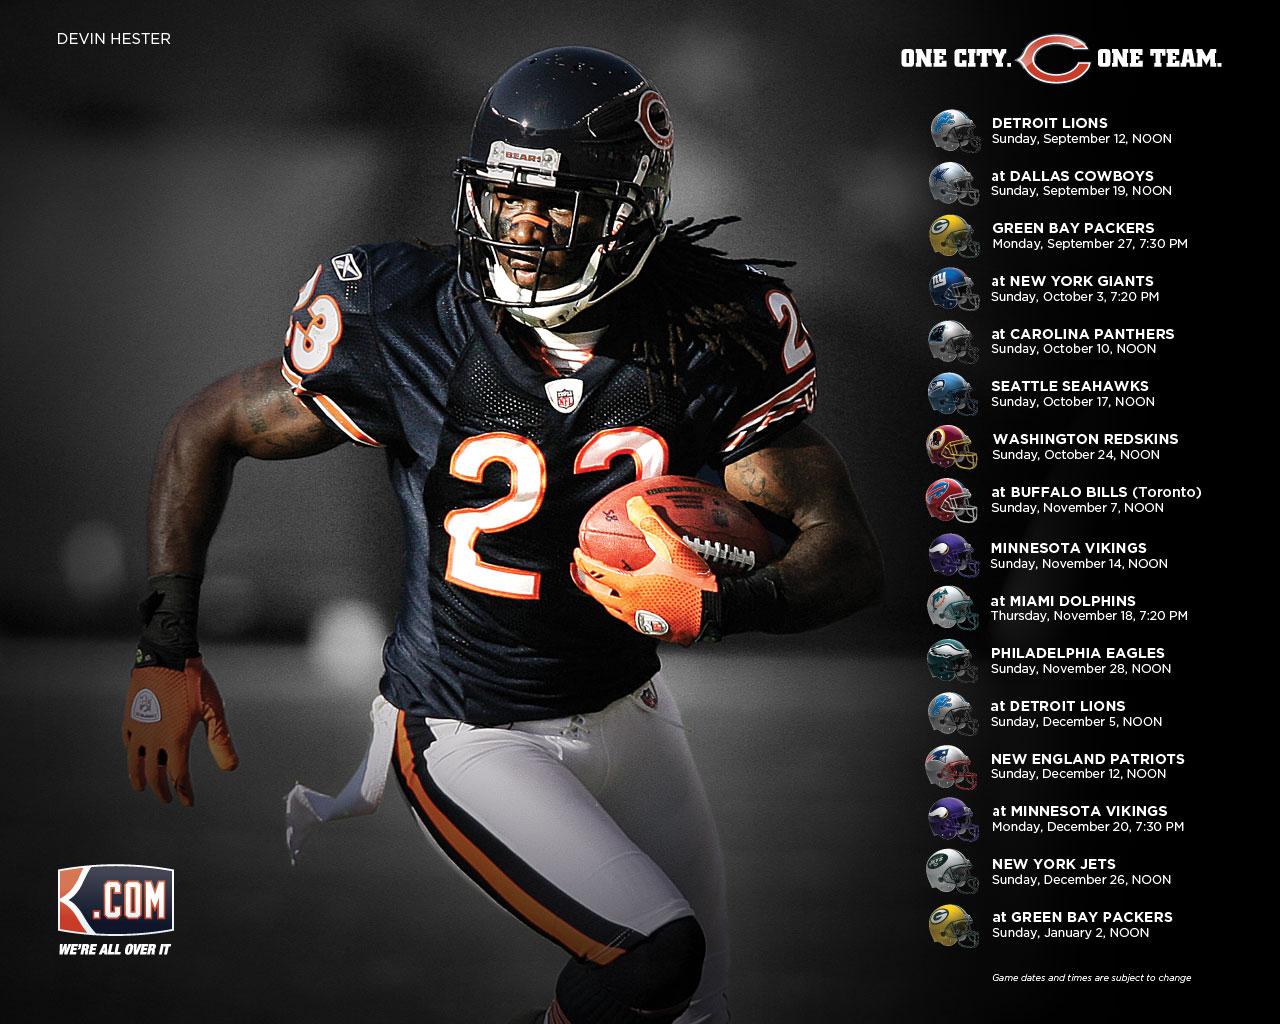 Chicago Bears wallpaper desktop wallpapers Chicago Bears wallpapers 1280x1024